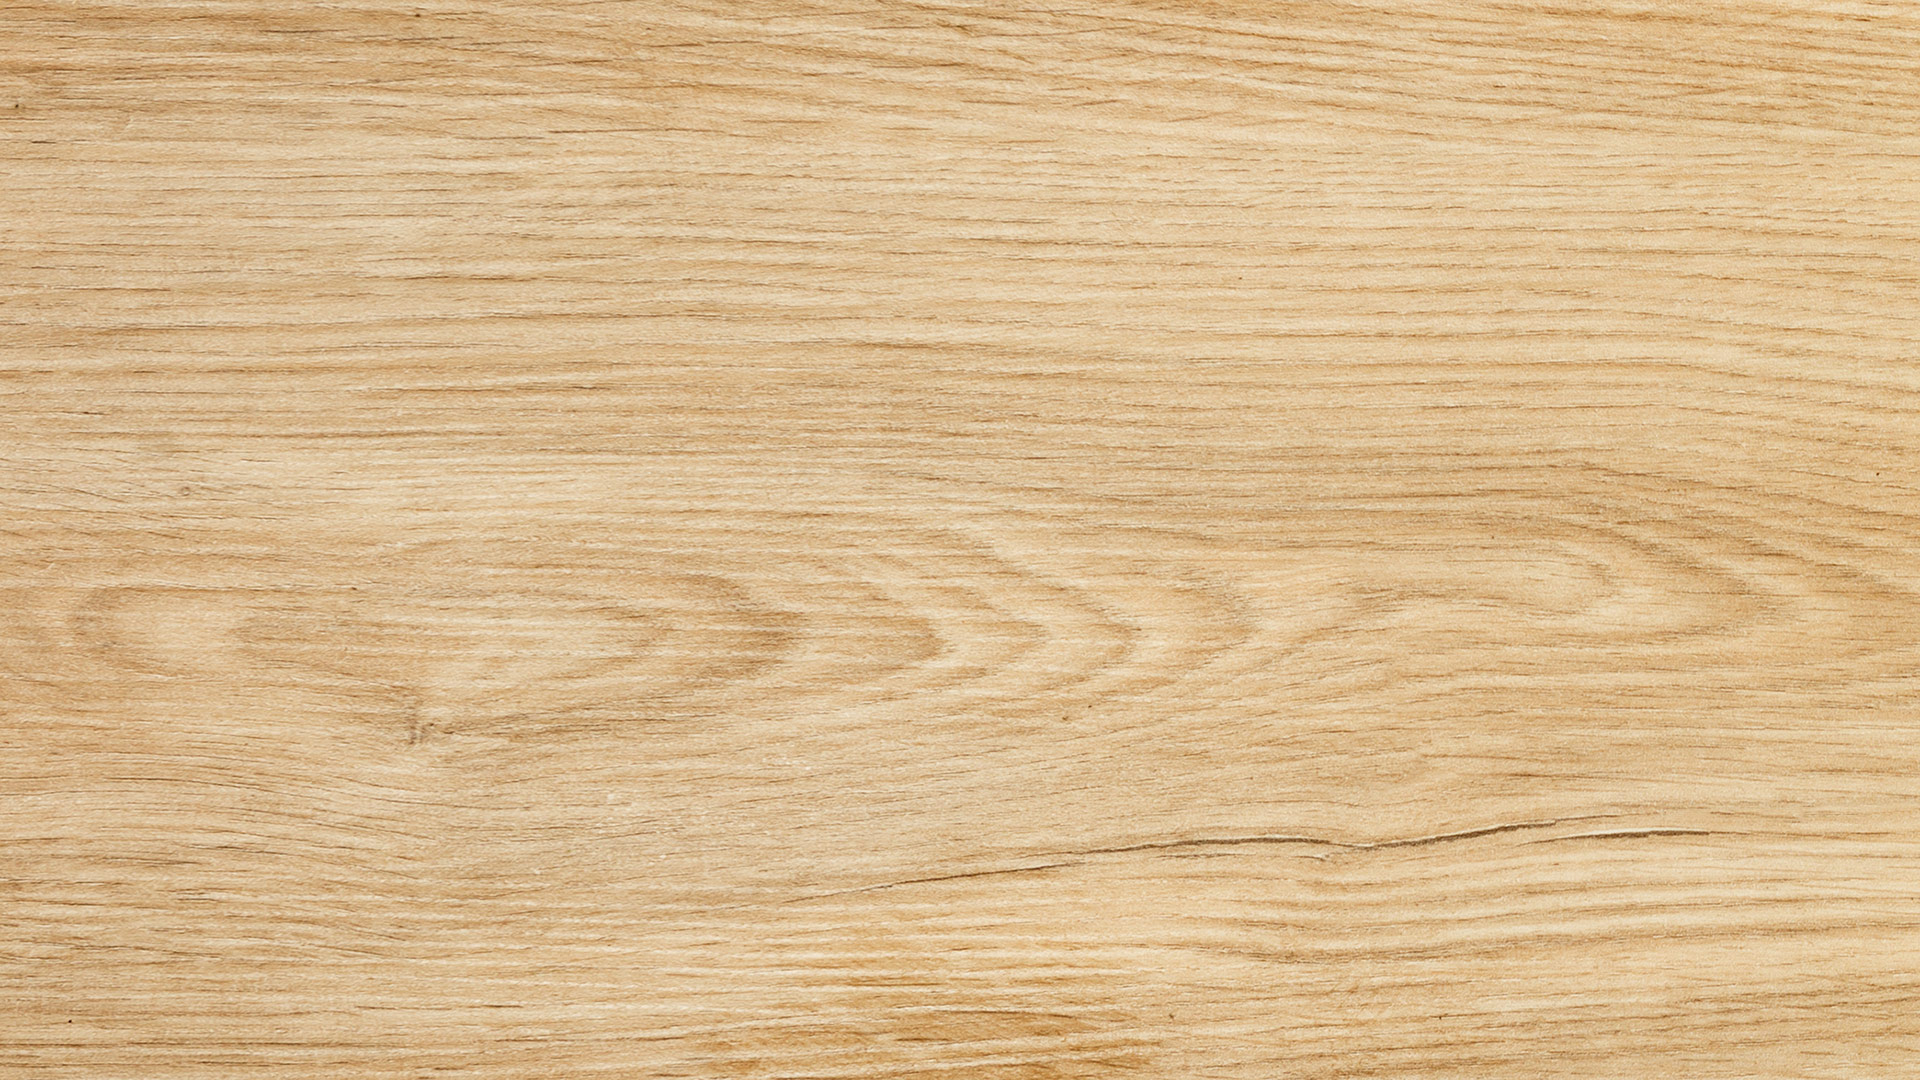 Ash-Black or White grain 1920x1080